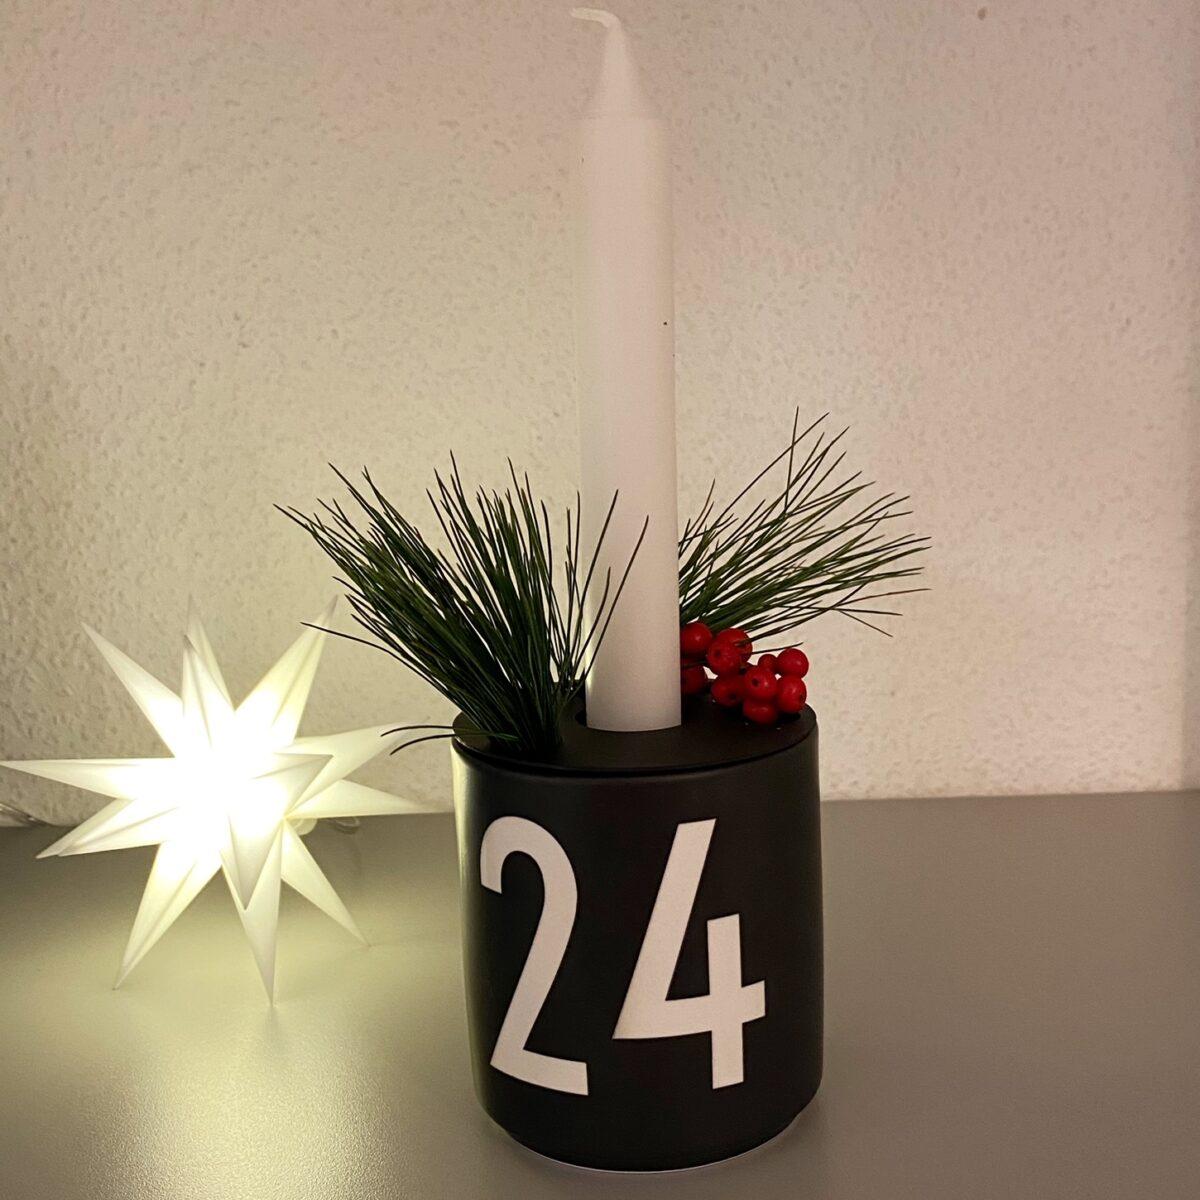 Becher 24 als Adventskranz